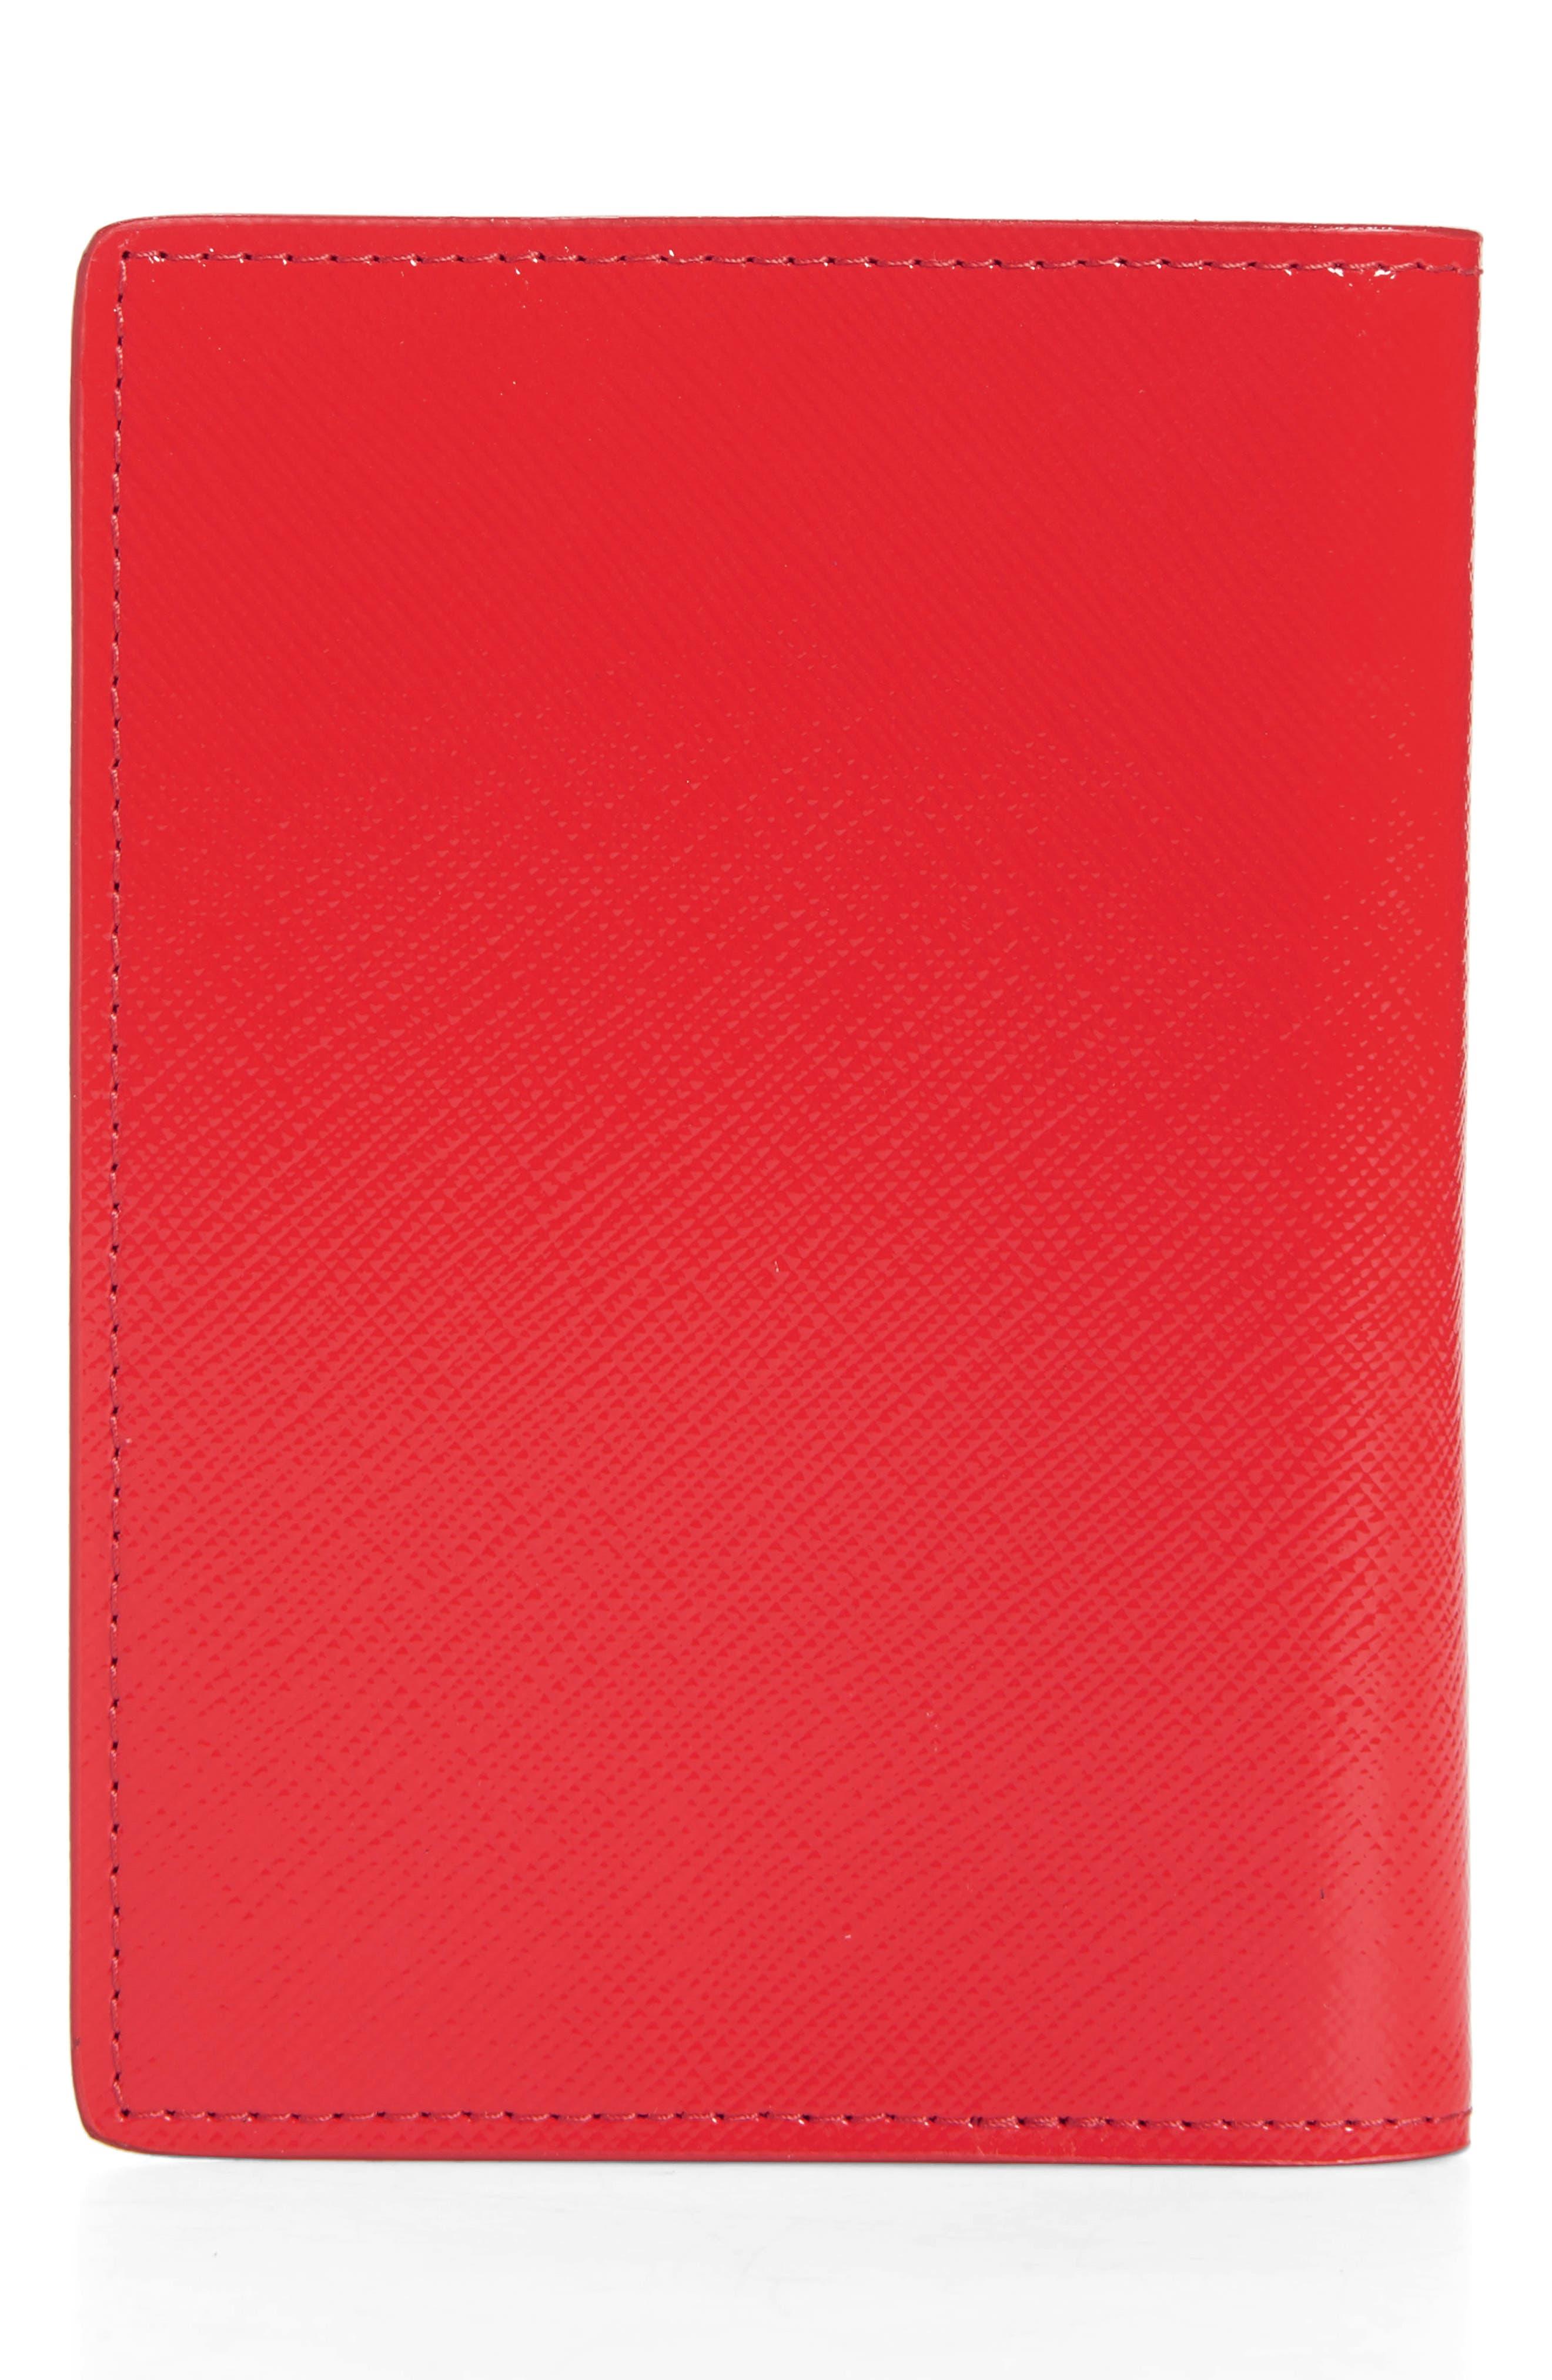 Alternate Image 2  - Nordstrom Leather Passport Case